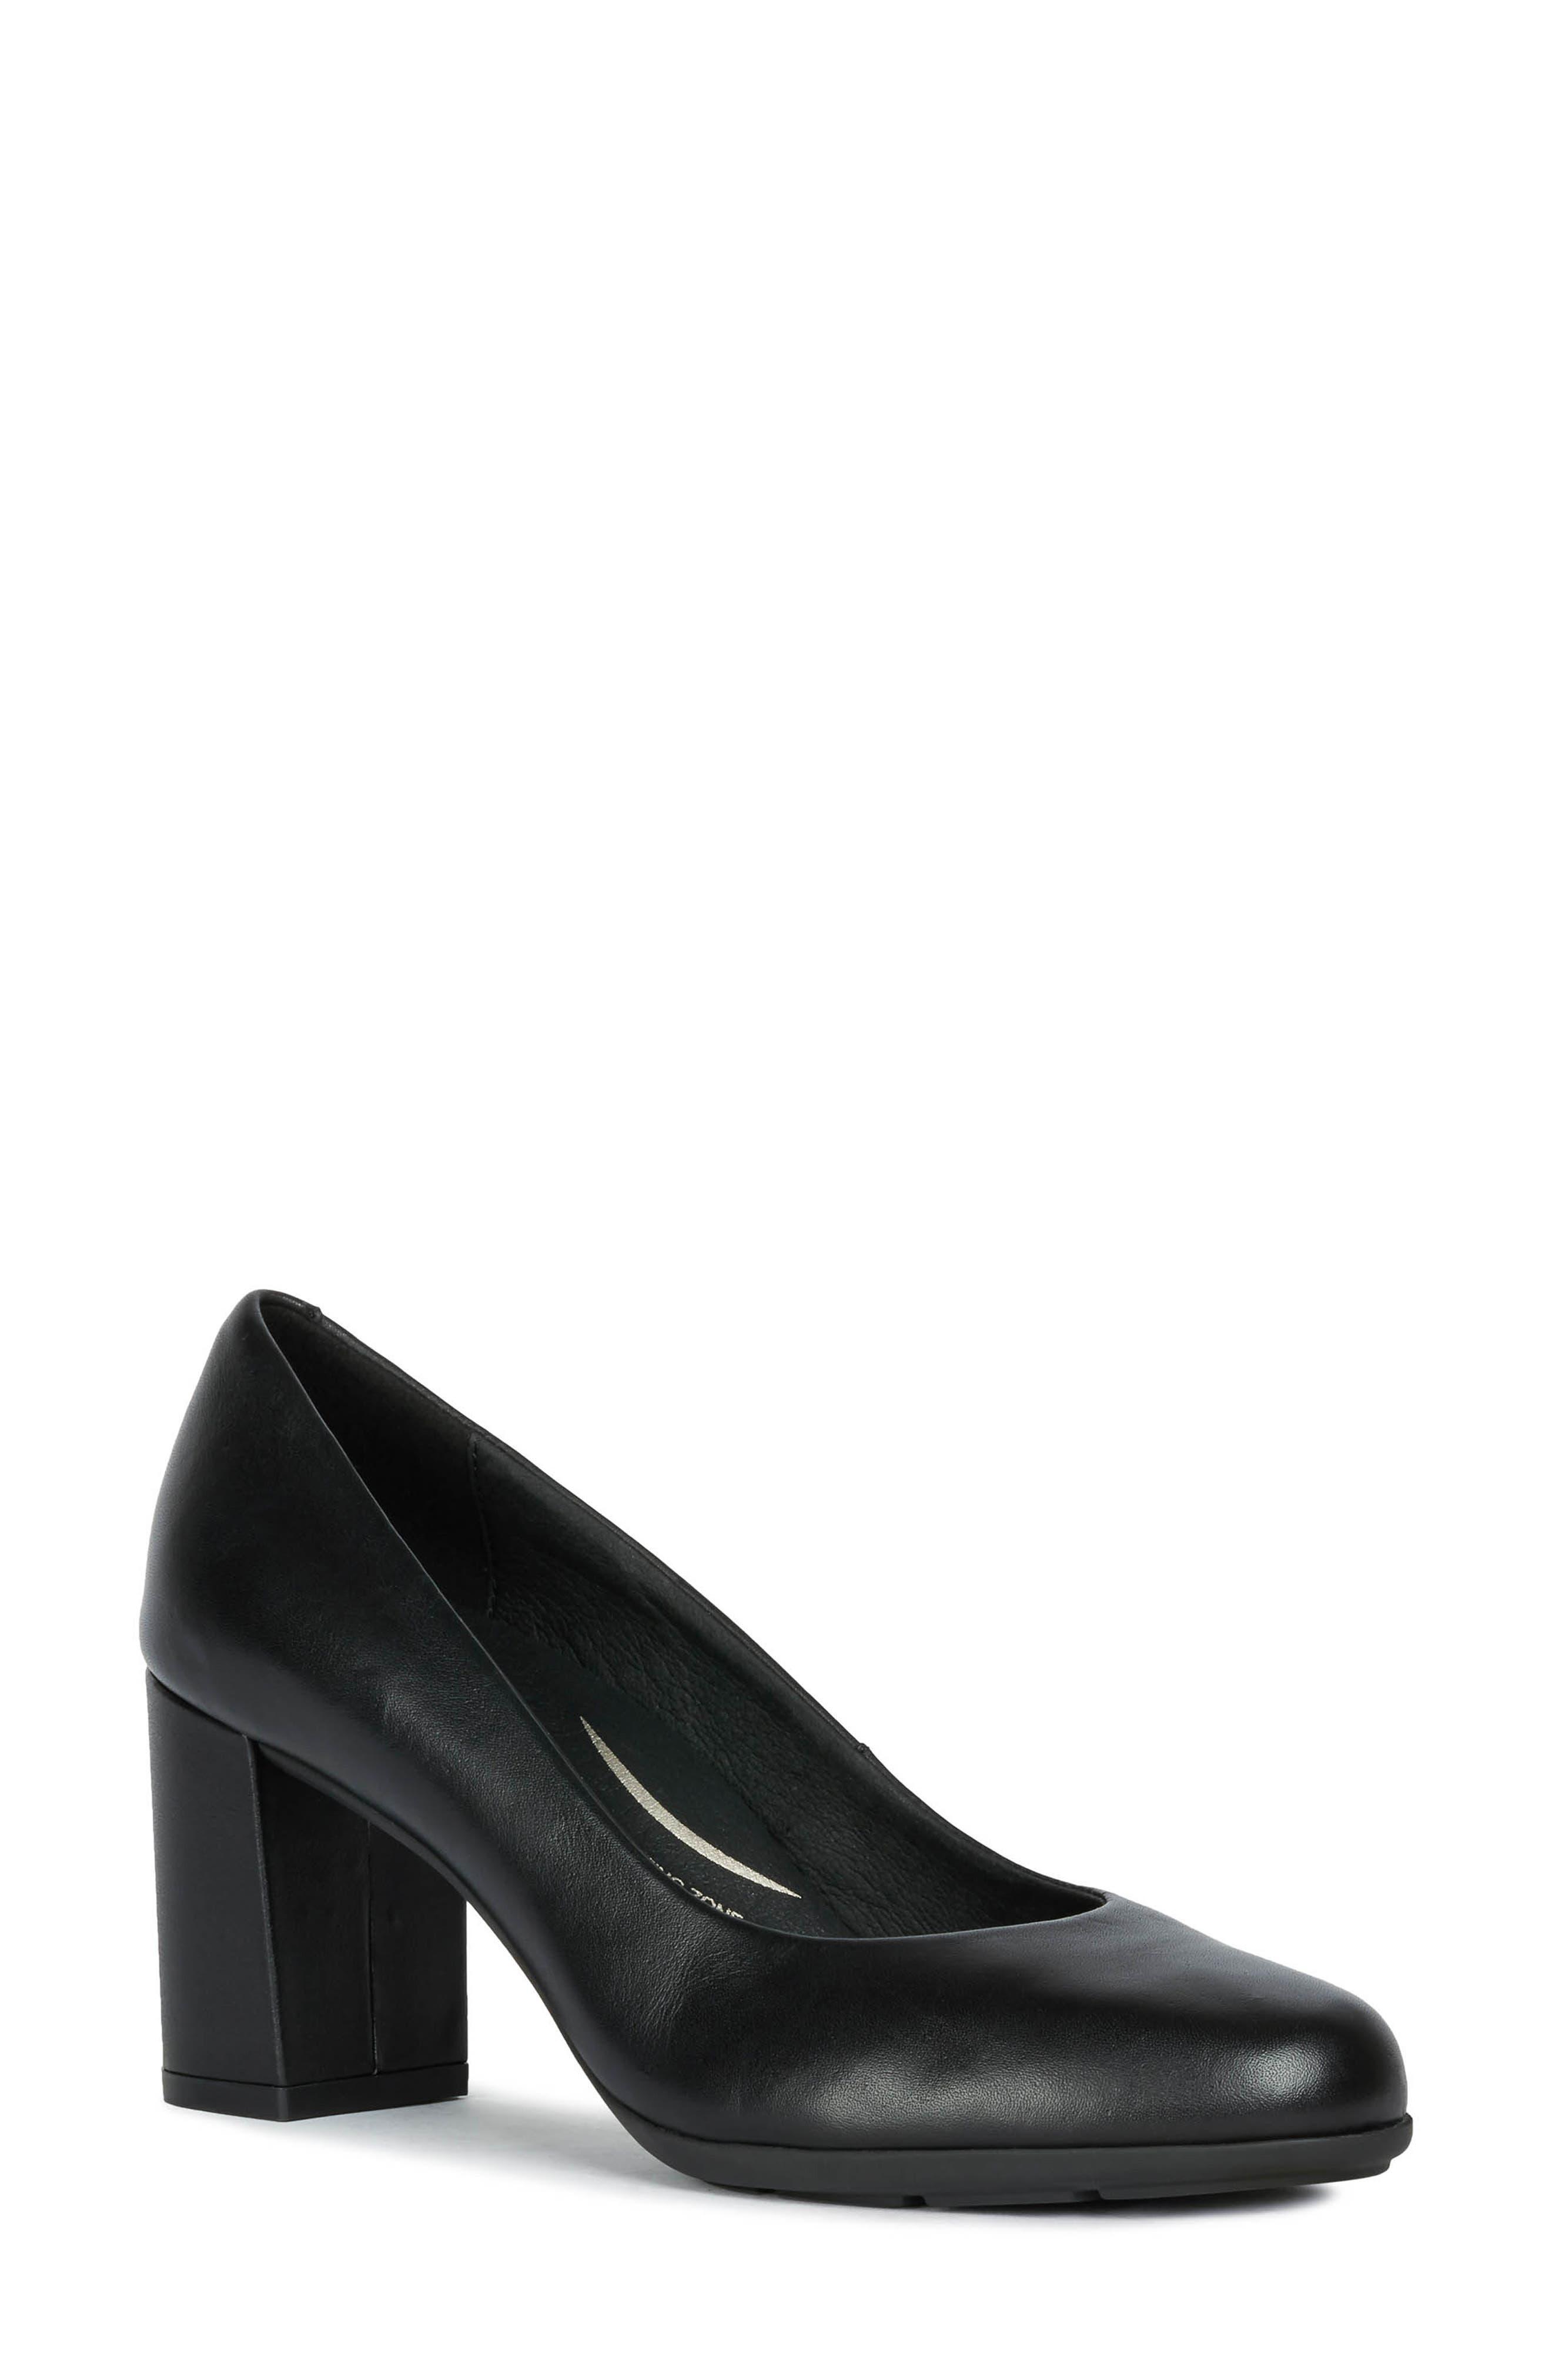 Women's Geox Shoes | Nordstrom